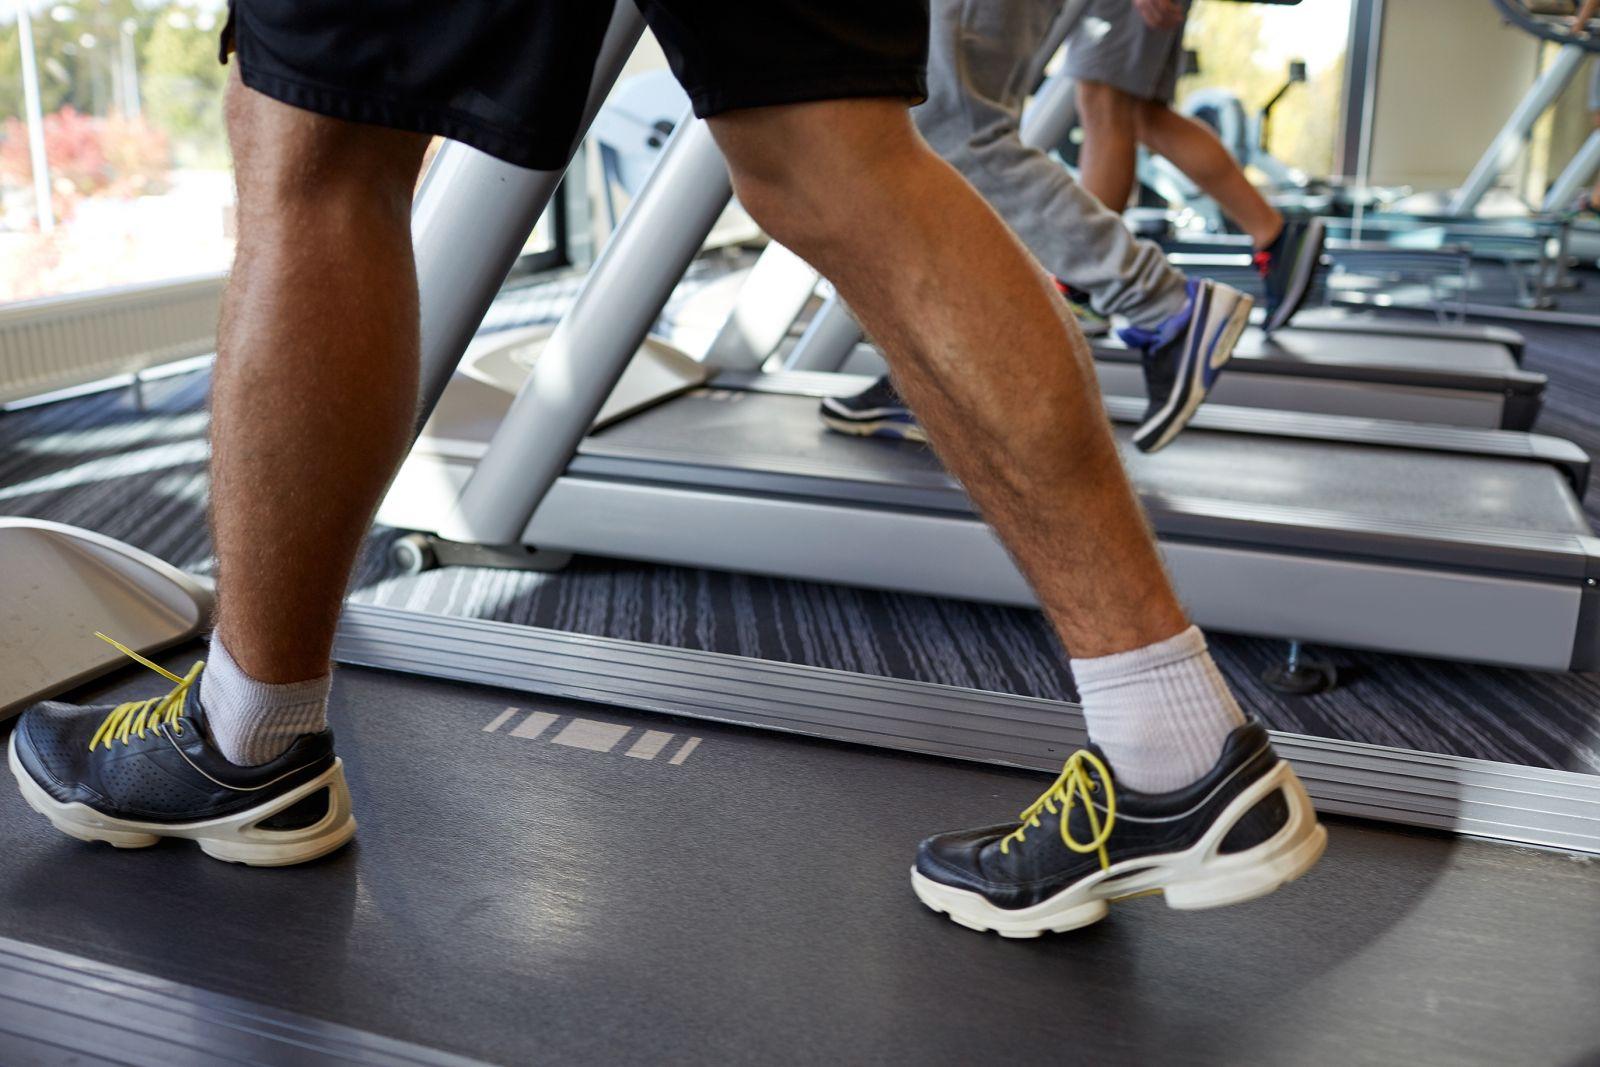 walking-fitness-exercise-treadmill